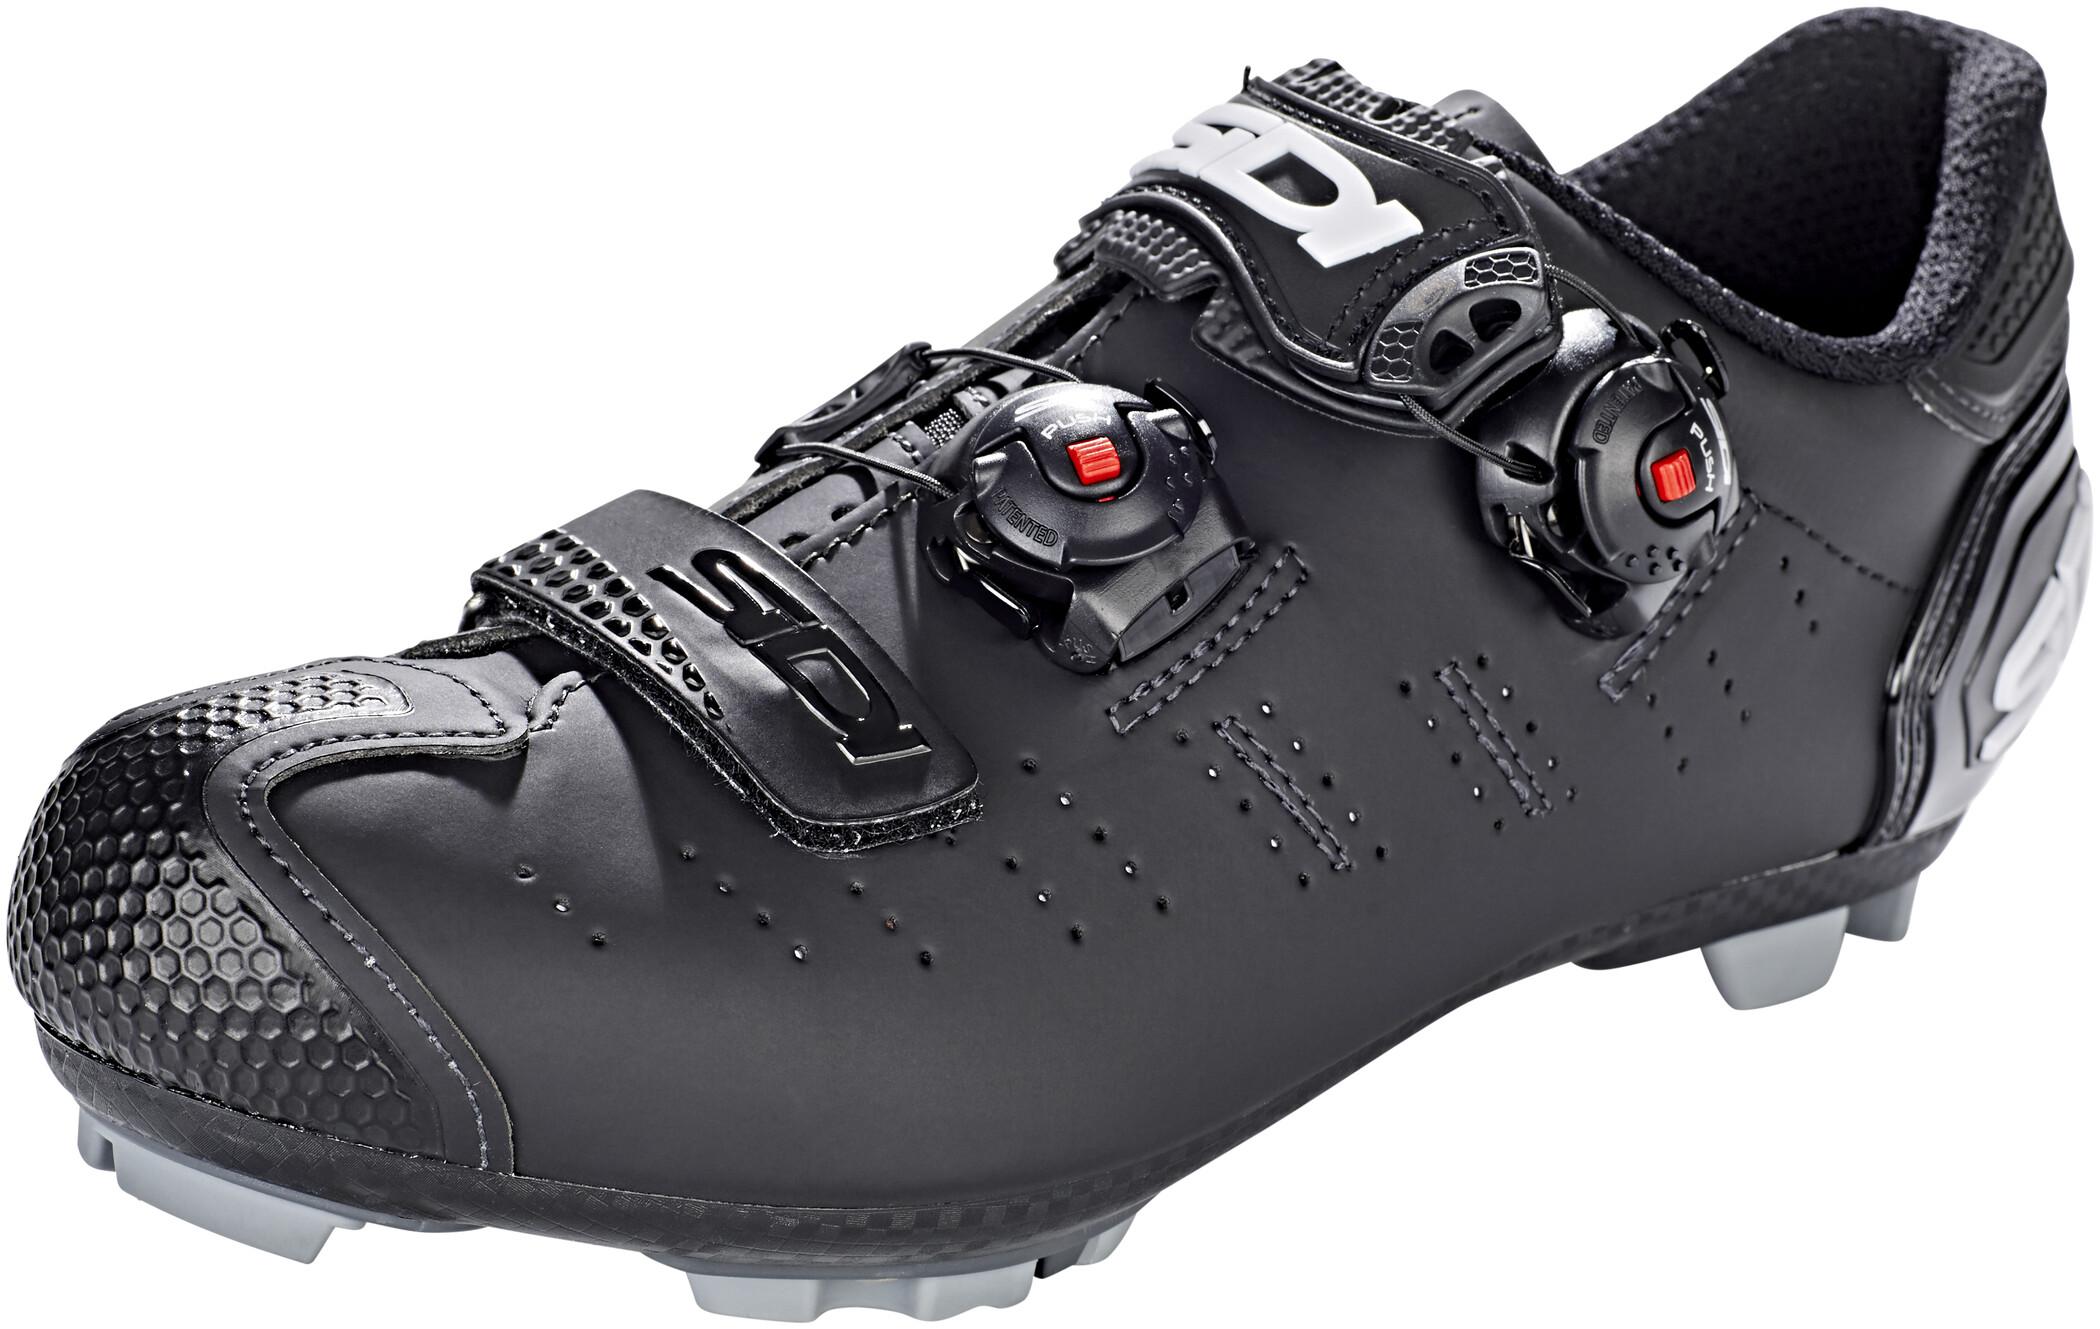 Sidi MTB Dragon 5 SRS Mega Sko Herrer, matt black (2019)   Shoes and overlays